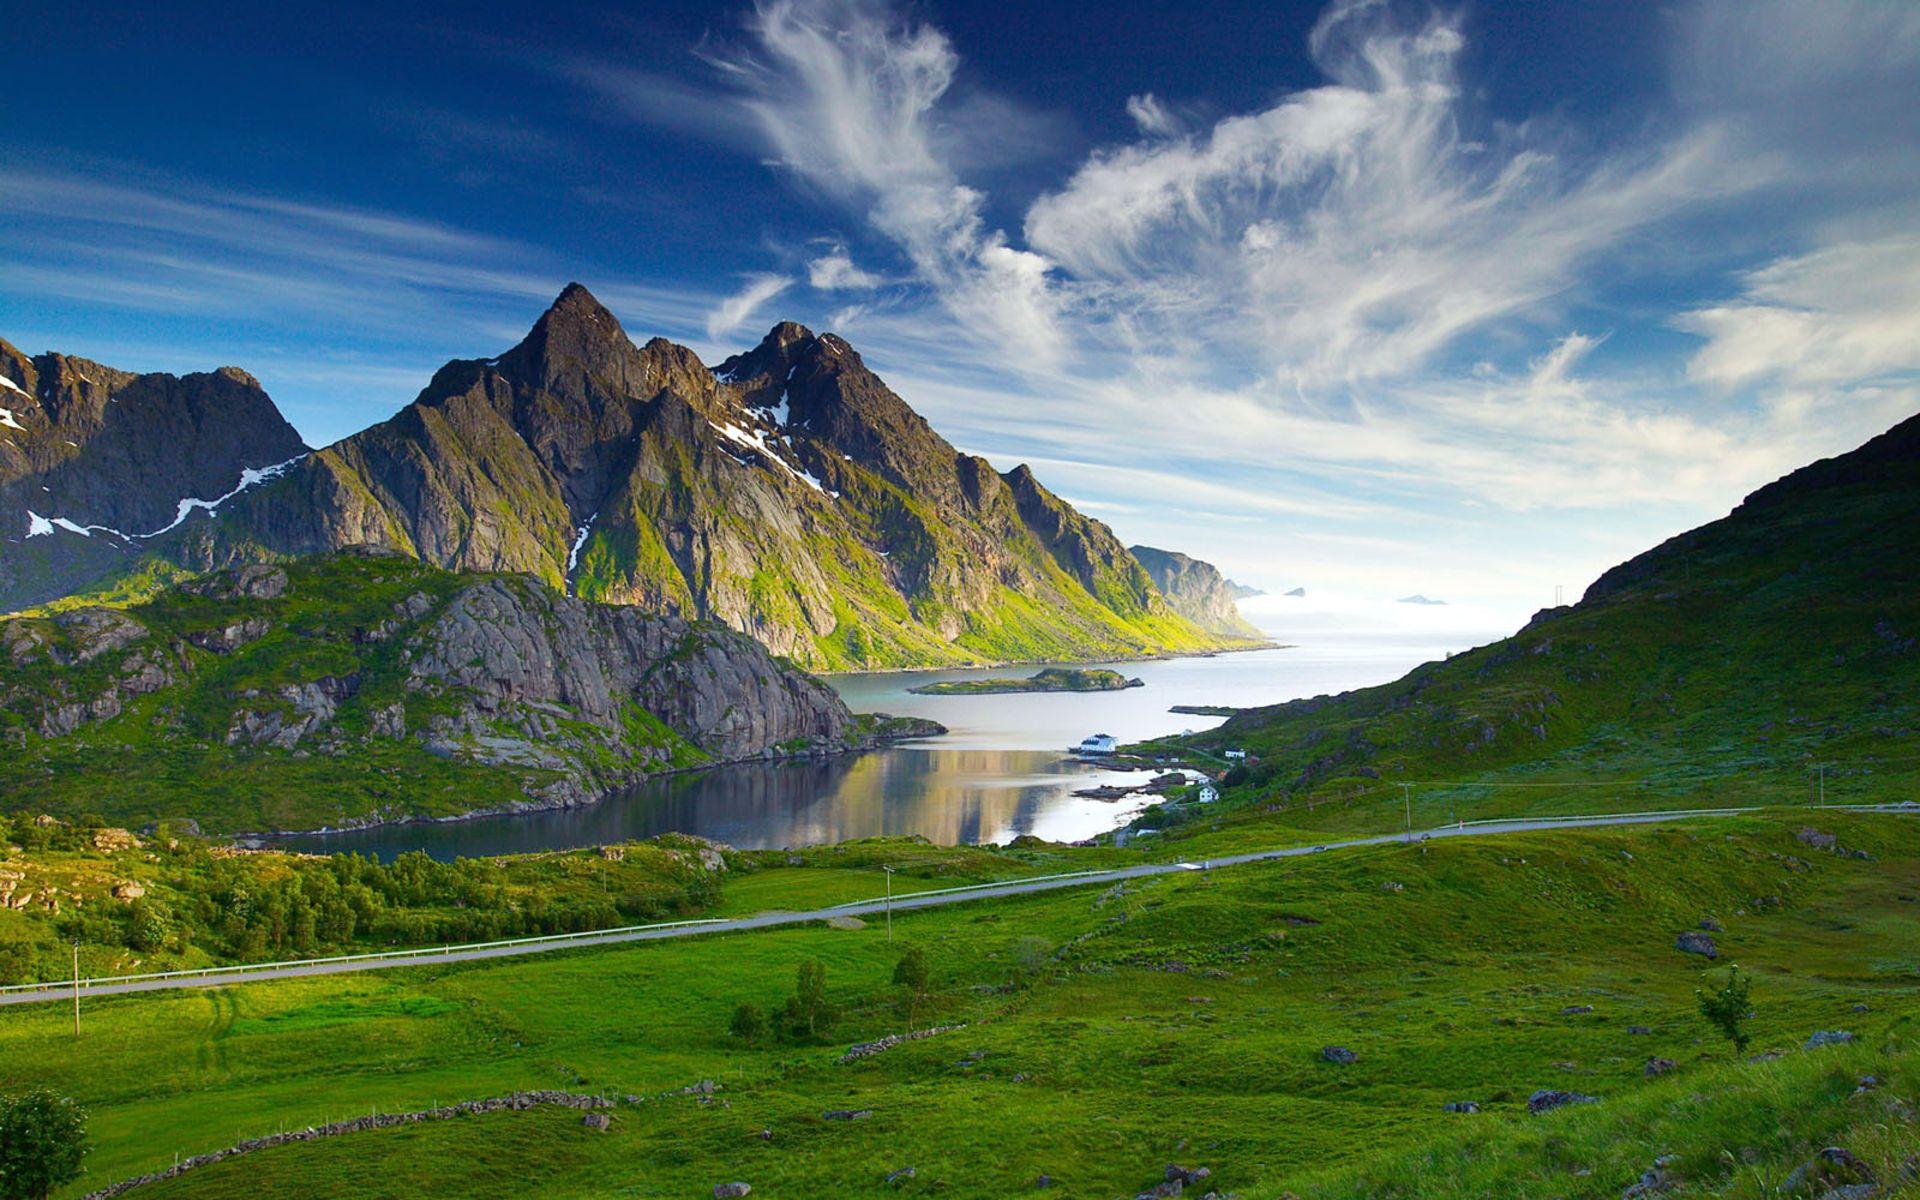 Molecule Wallpapers High Quality High Resolution Backgrounds Hd Landscape Landscape Wallpaper Mountain Landscape